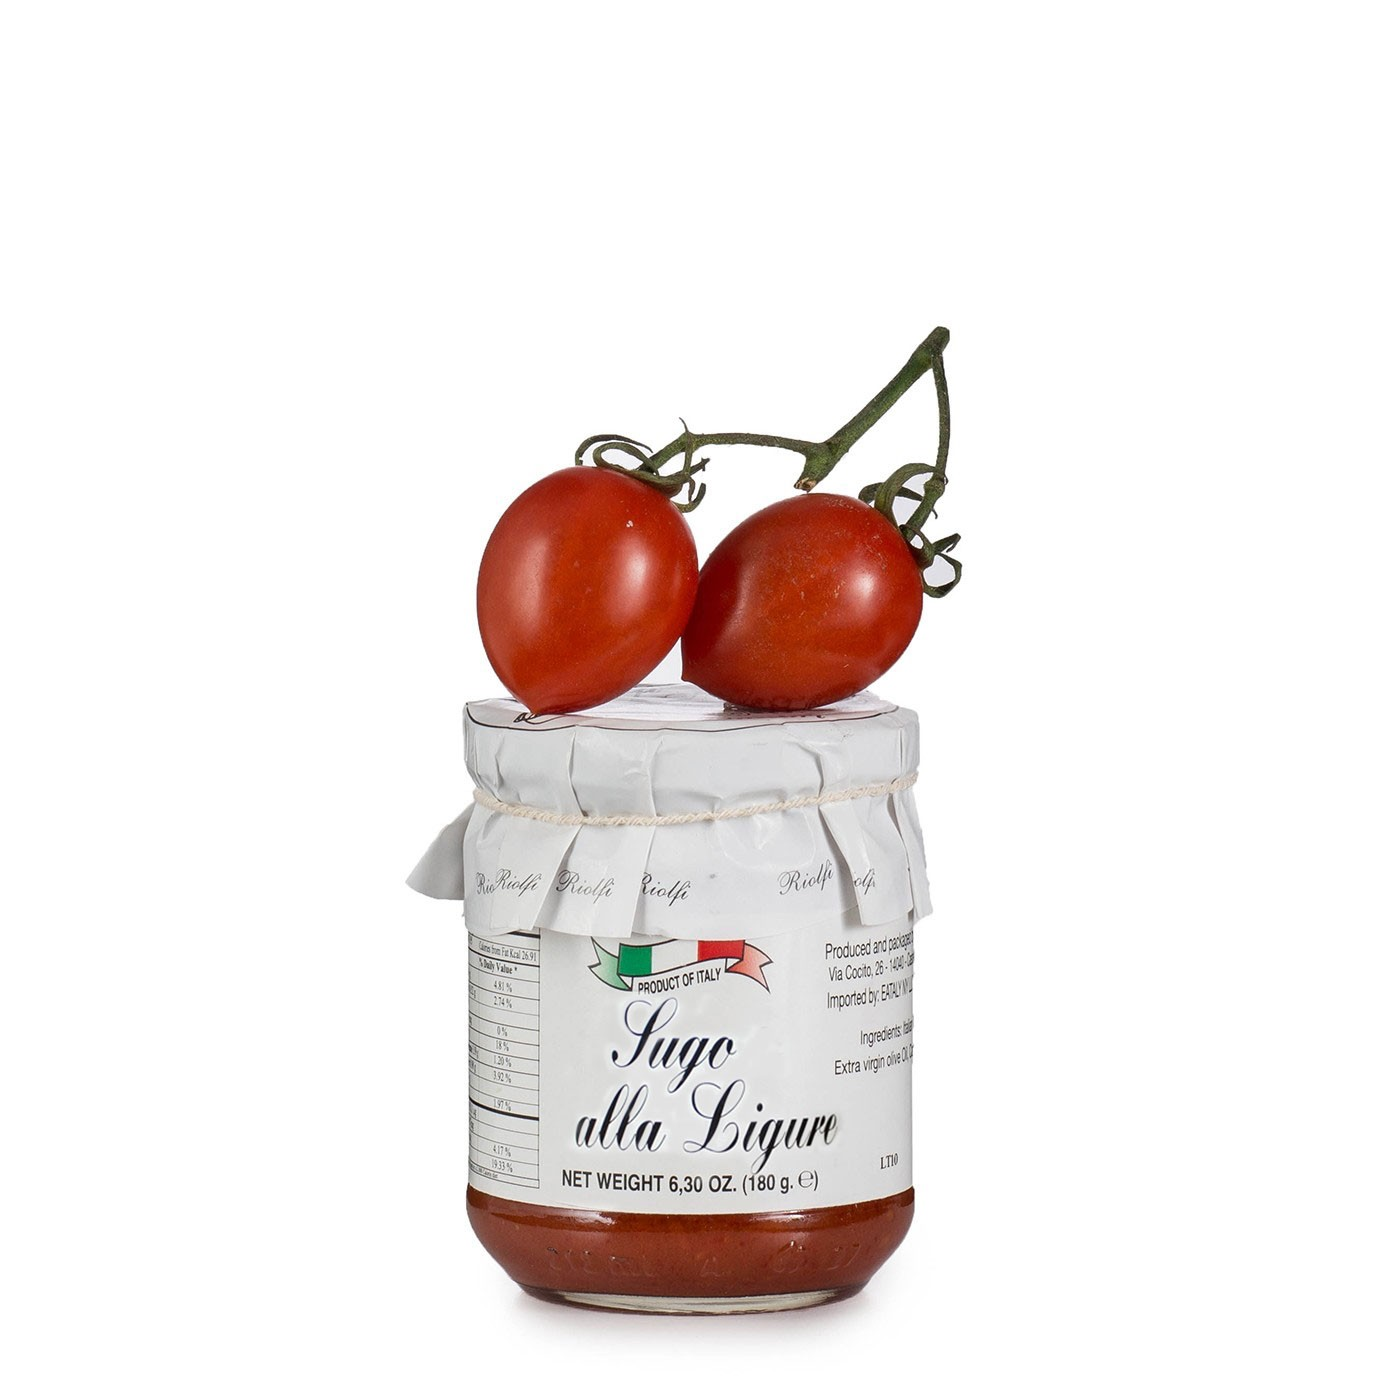 Ligurian Tomato Sauce with Basil 6.3 oz